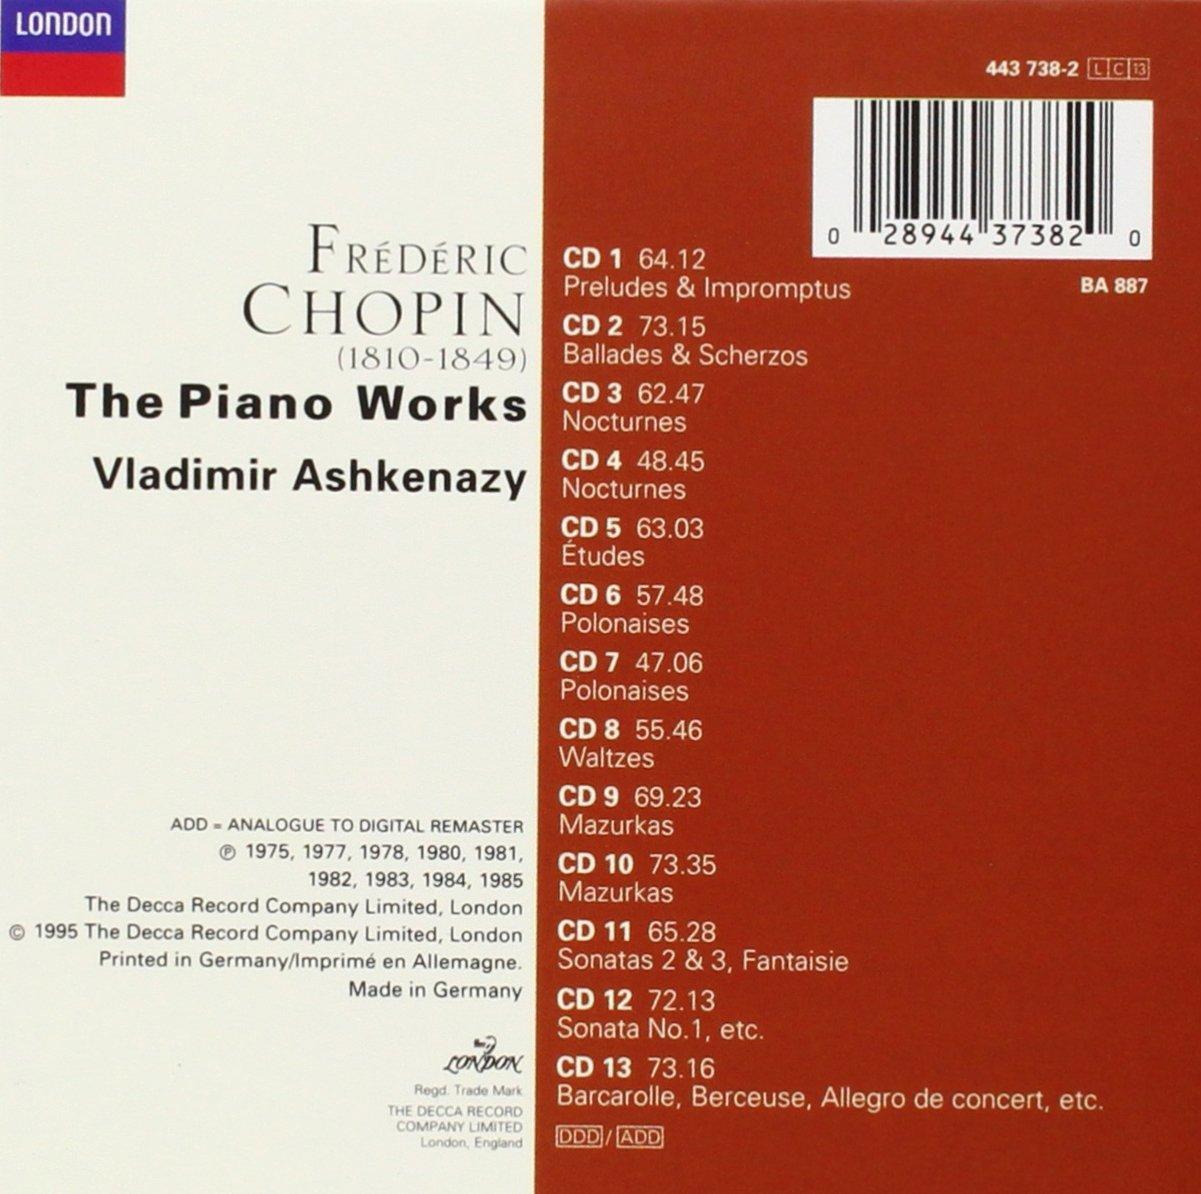 Frederic Chopin Vladimir Ashkenazy Chopin The Piano Works